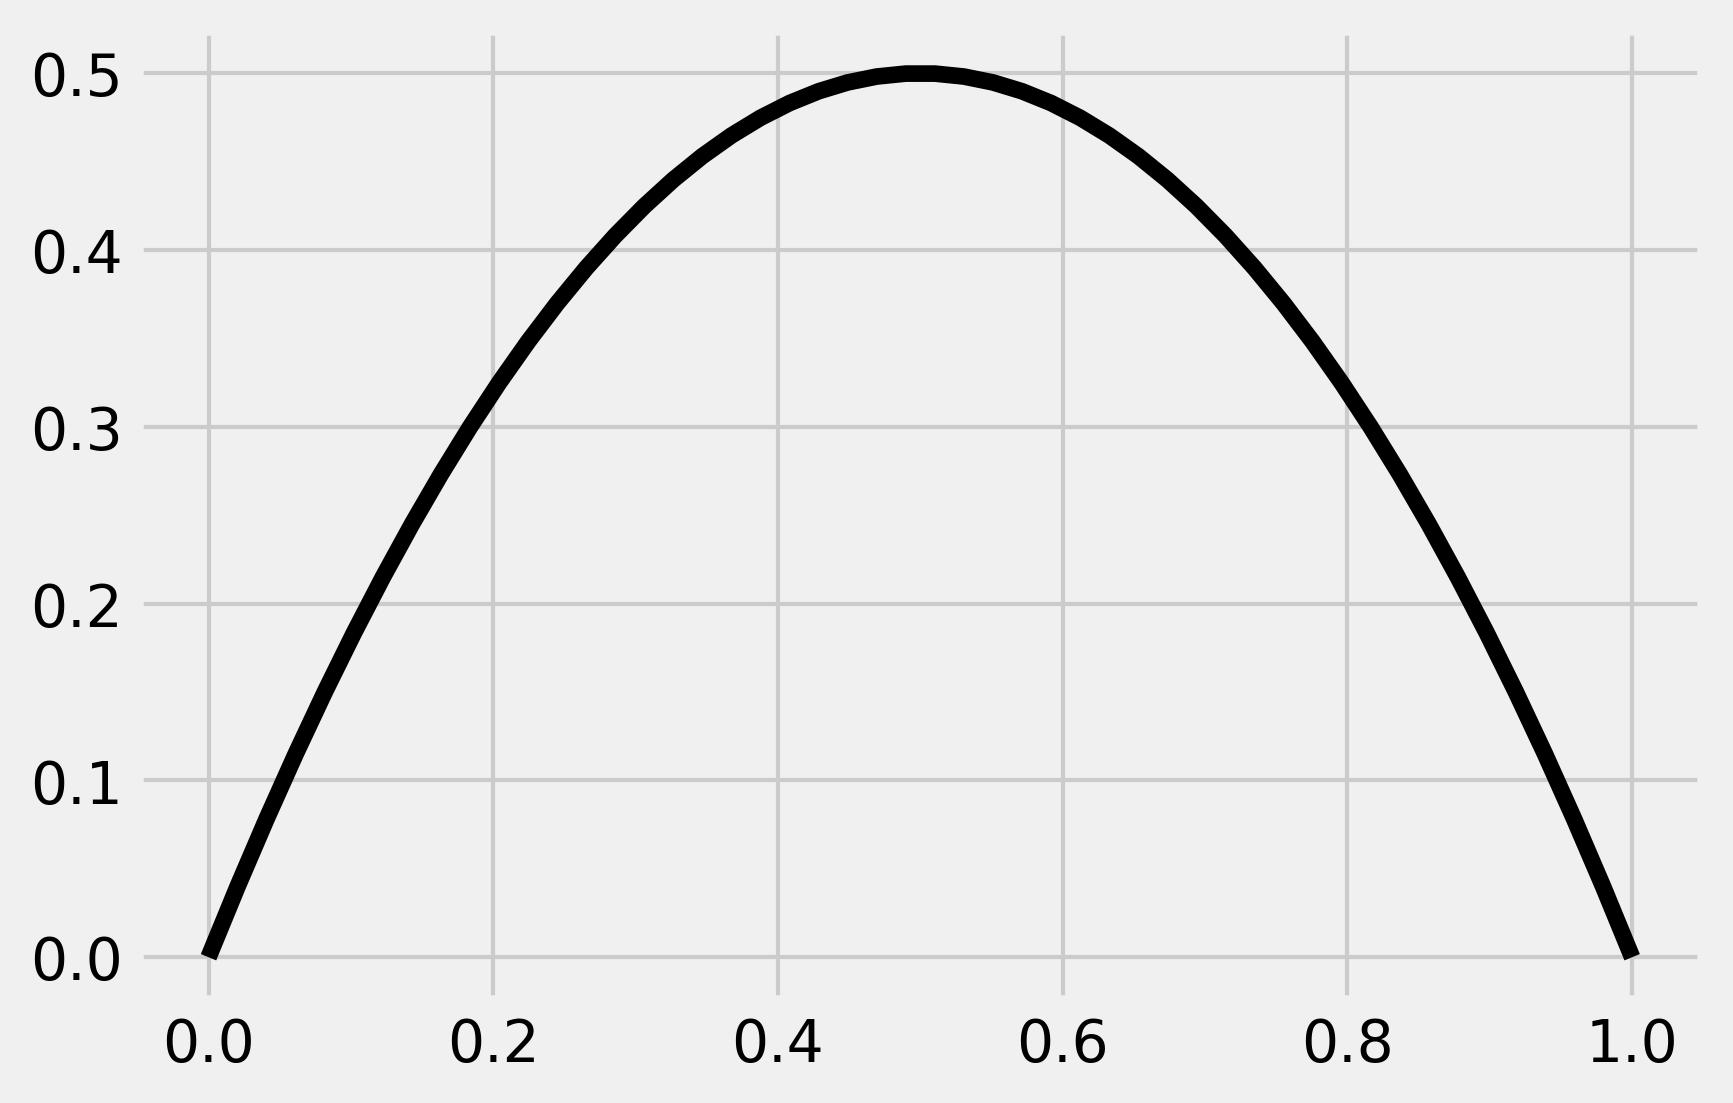 <matplotlib.figure.Figure at 0x7f994e75dc88>